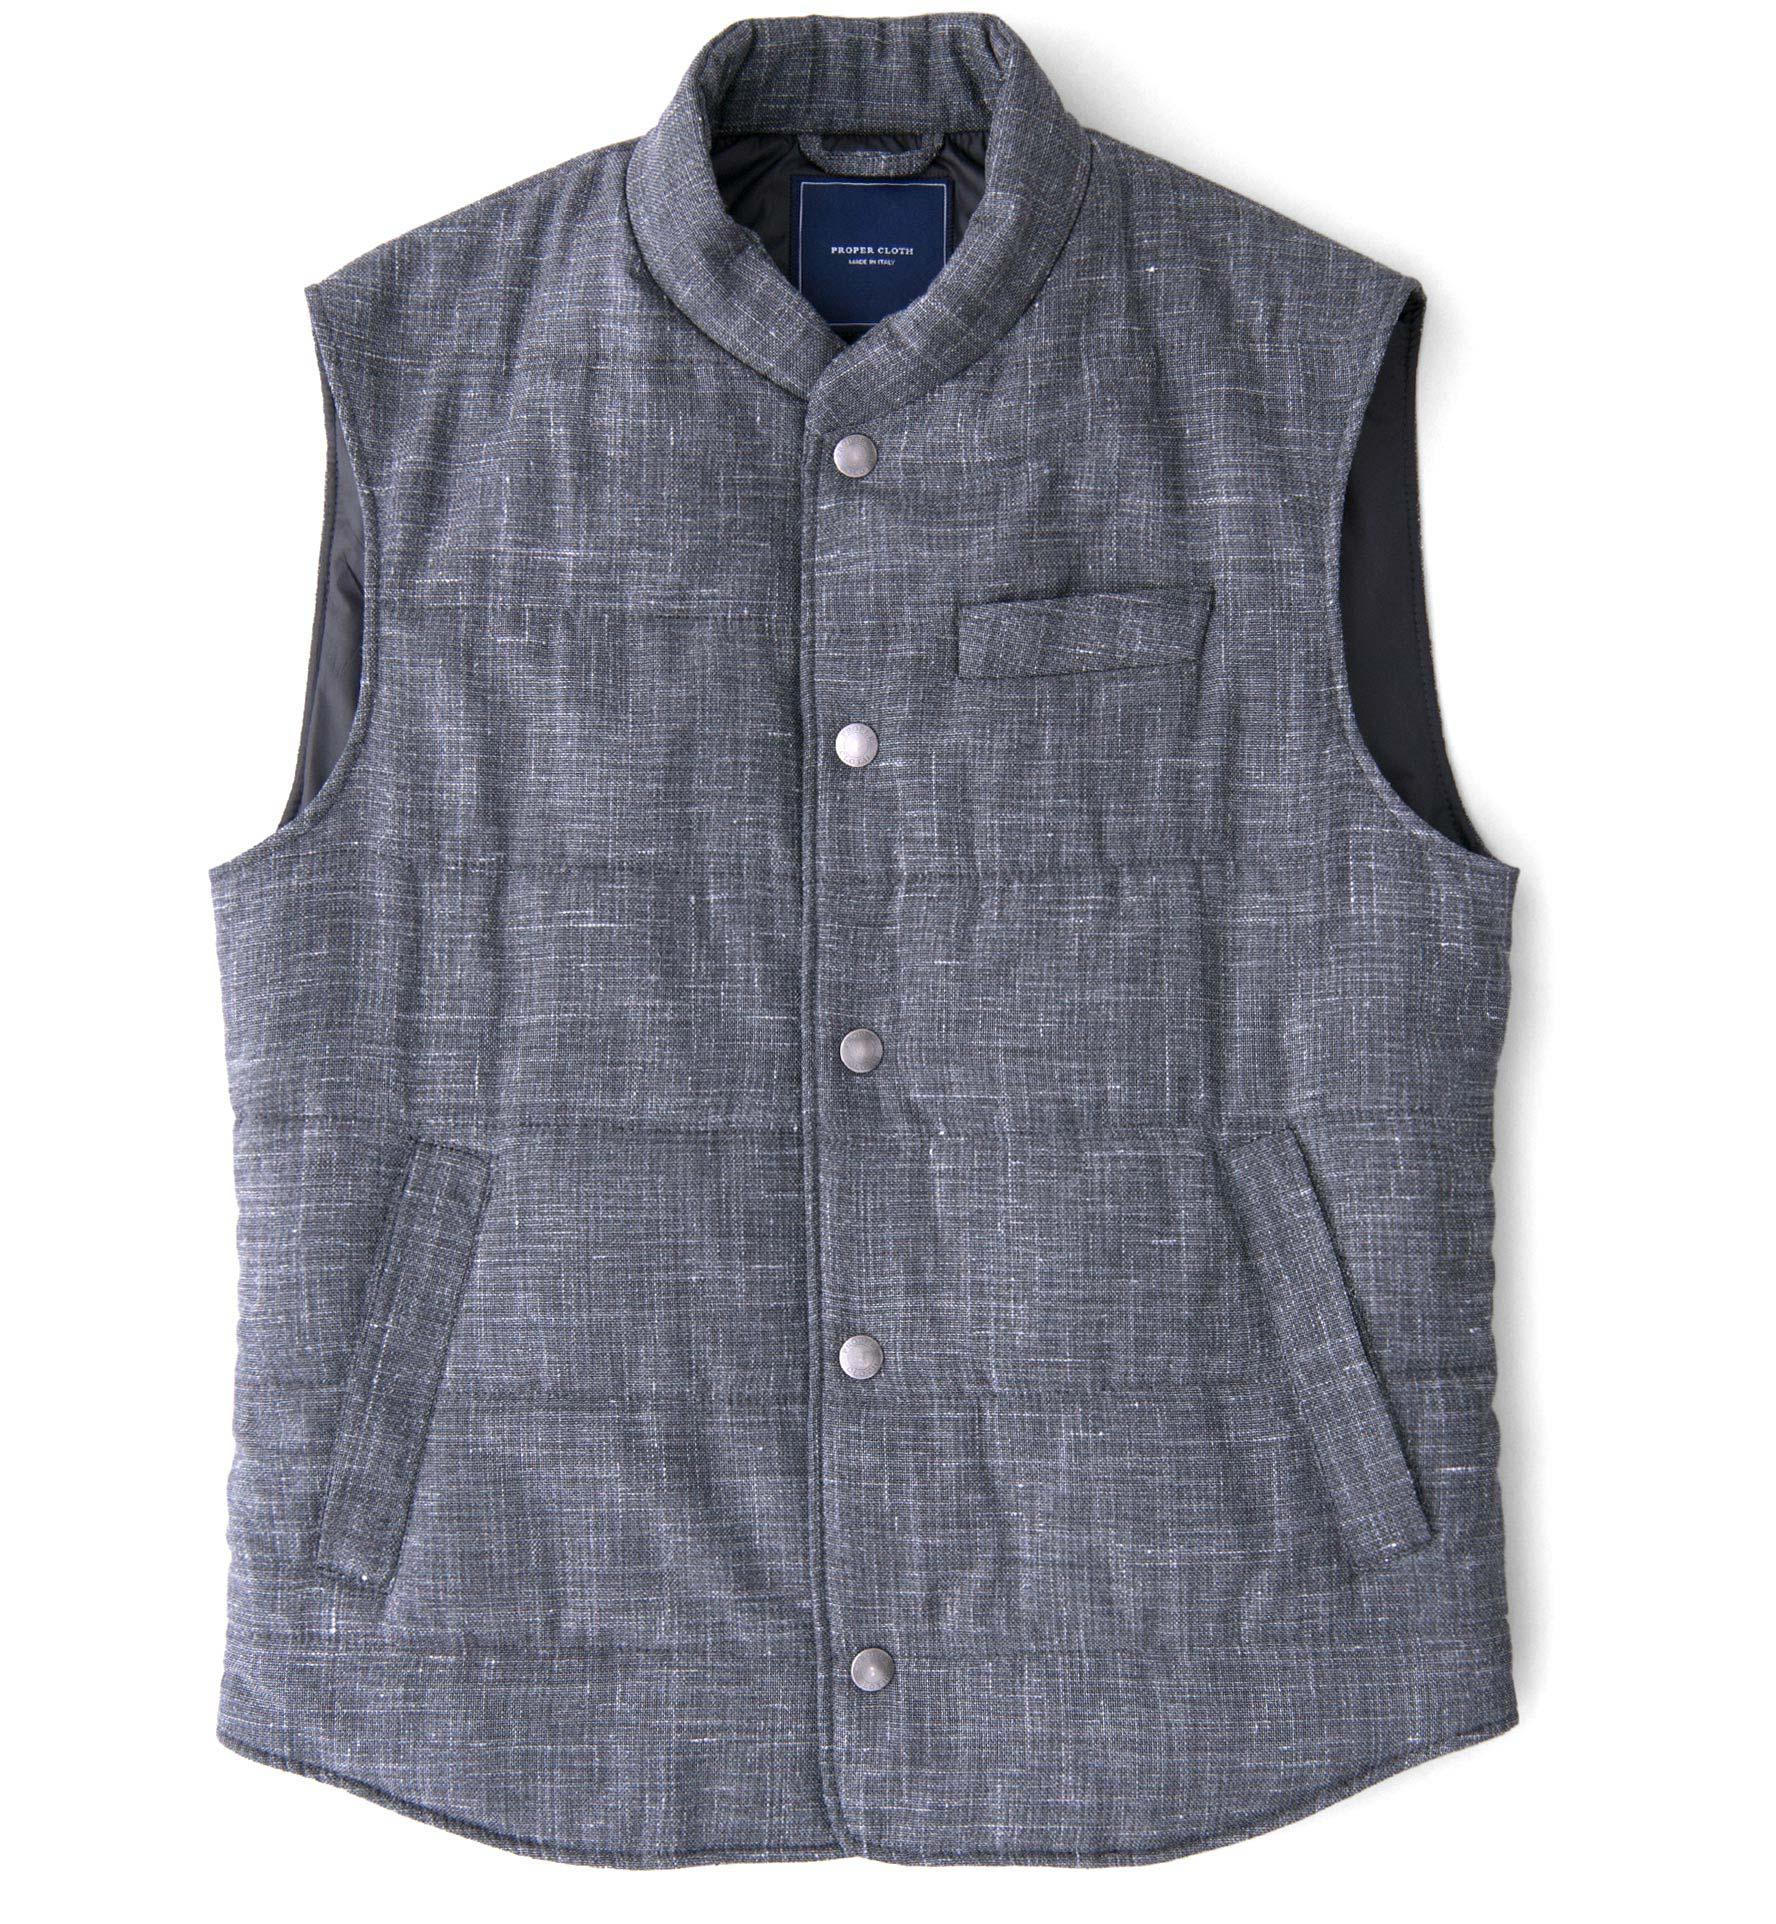 Zoom Image of Cortina I Grey Slub Wool Blend Vest